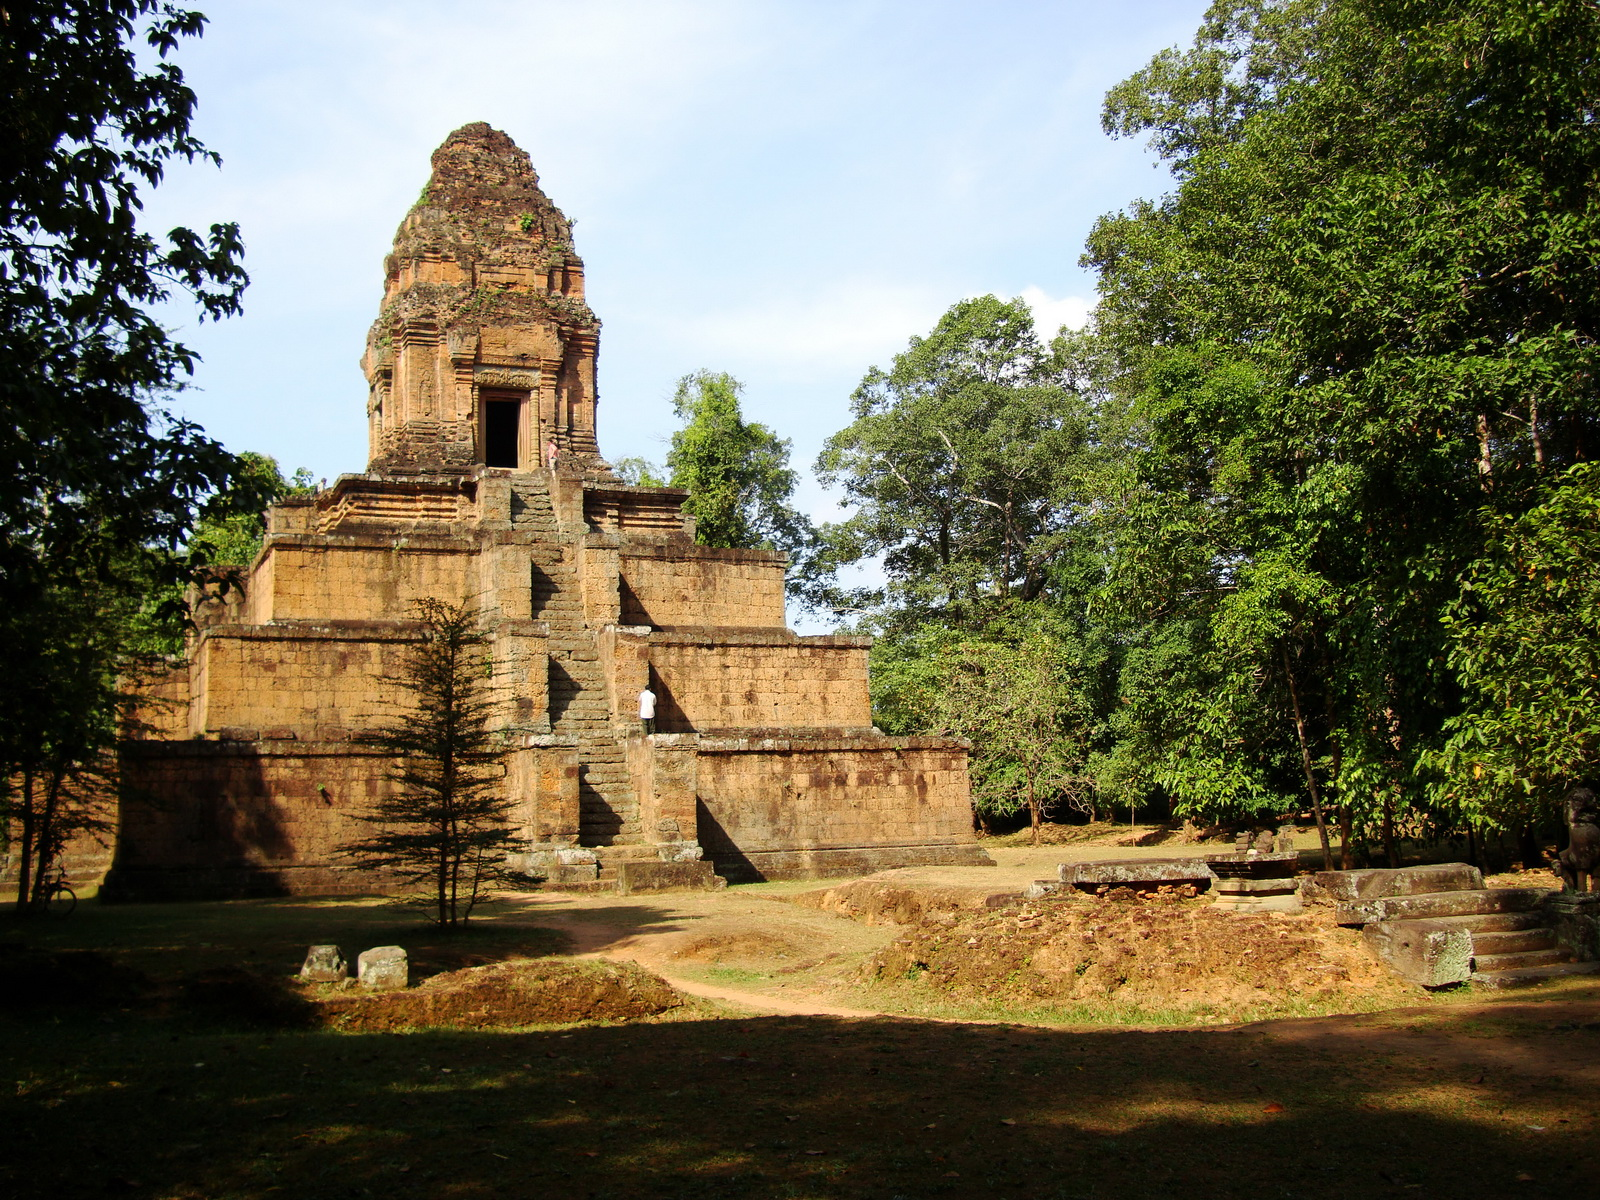 Baksei Chamkrong Temple Angkor Siem Reap Cambodia Jan 2010 11